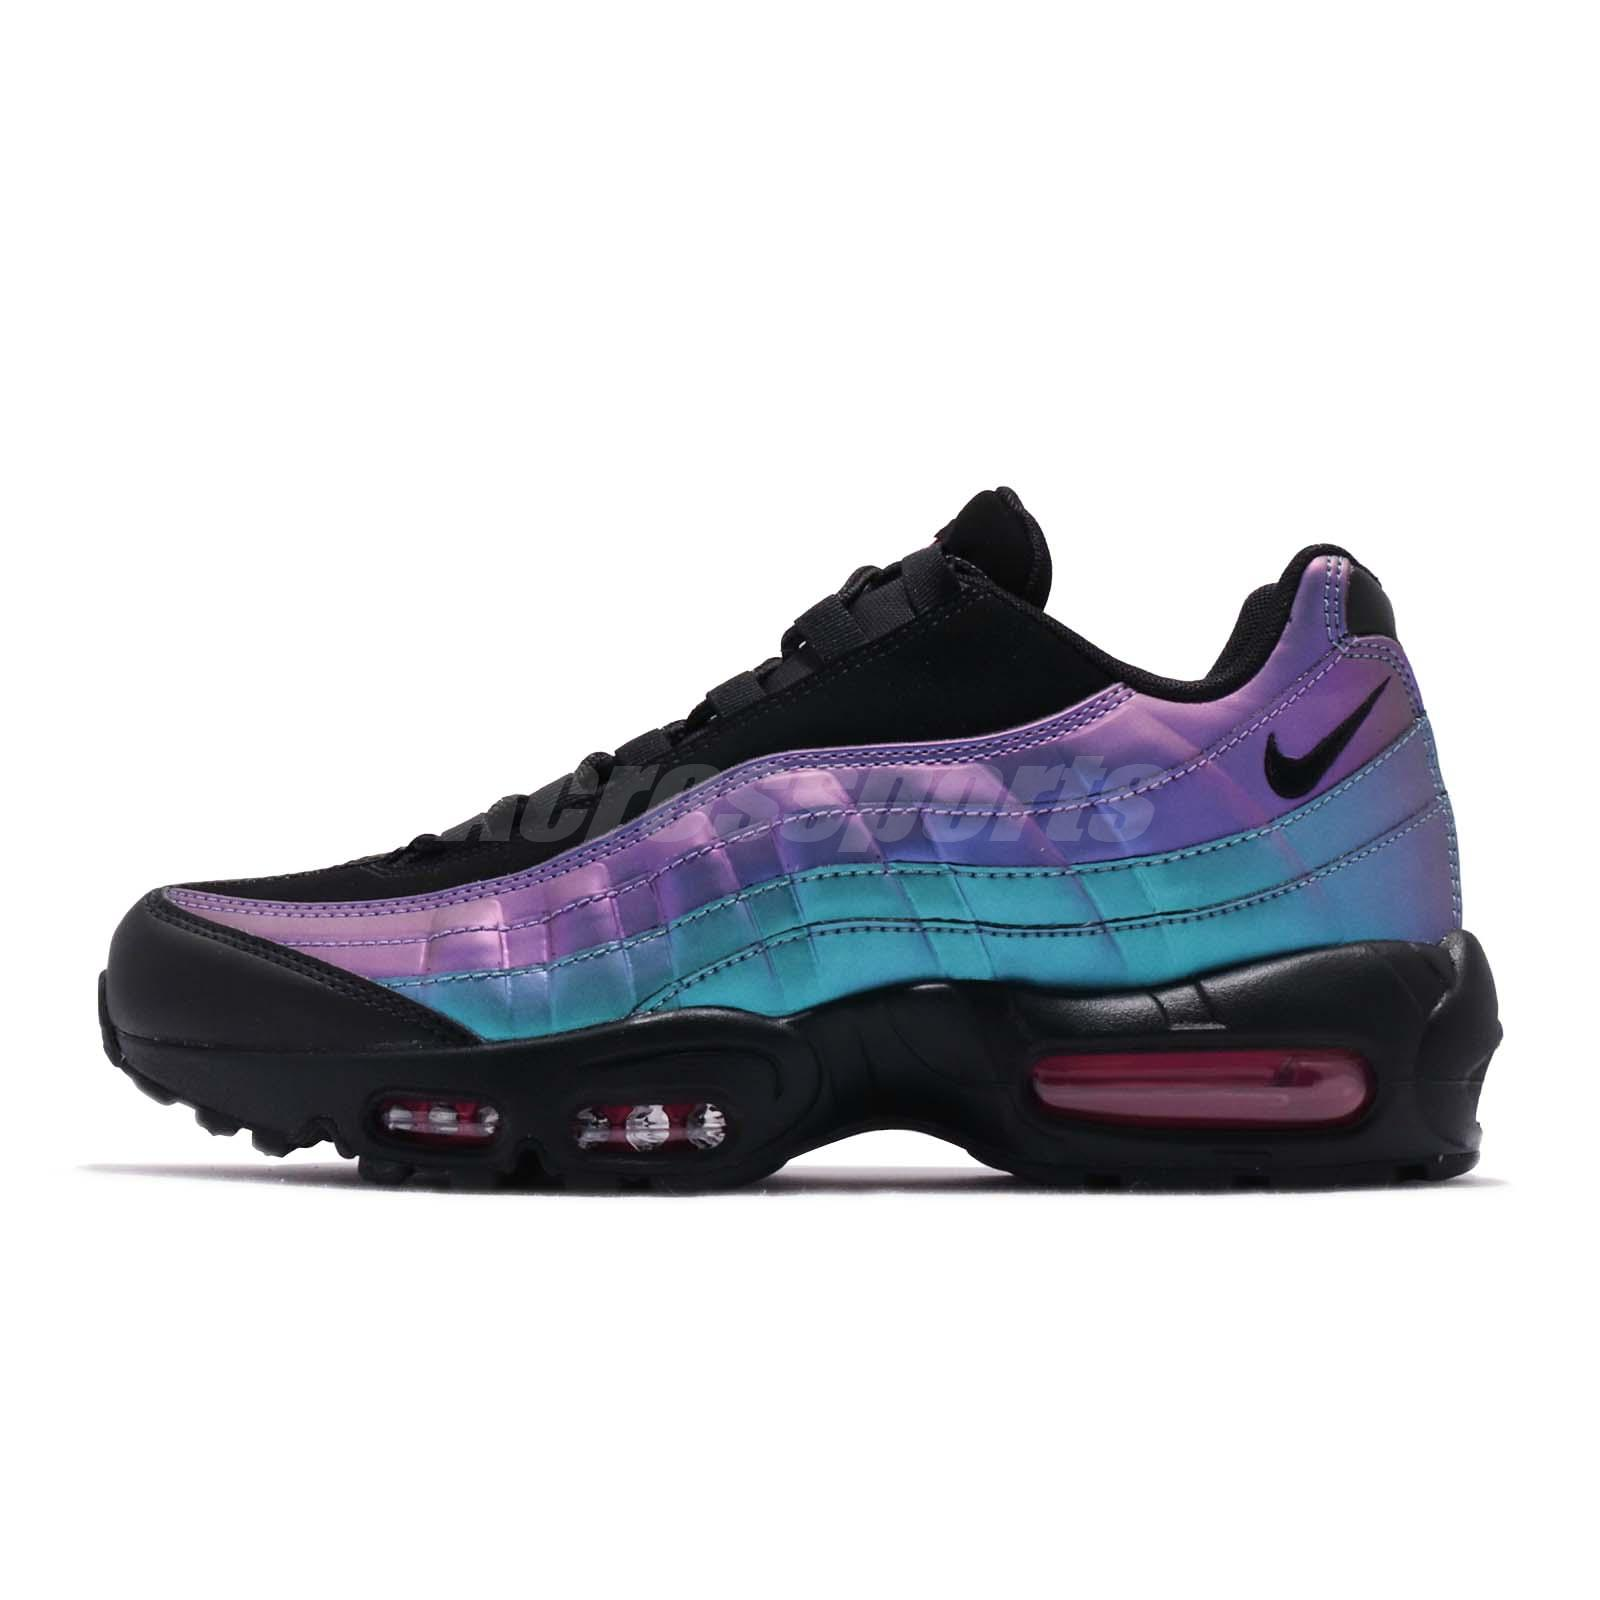 the best attitude 1cec0 ac16f Nike Air Max 95 PRM Throwback Future Black Laser Fuchsia Men Shoes 538416- 021